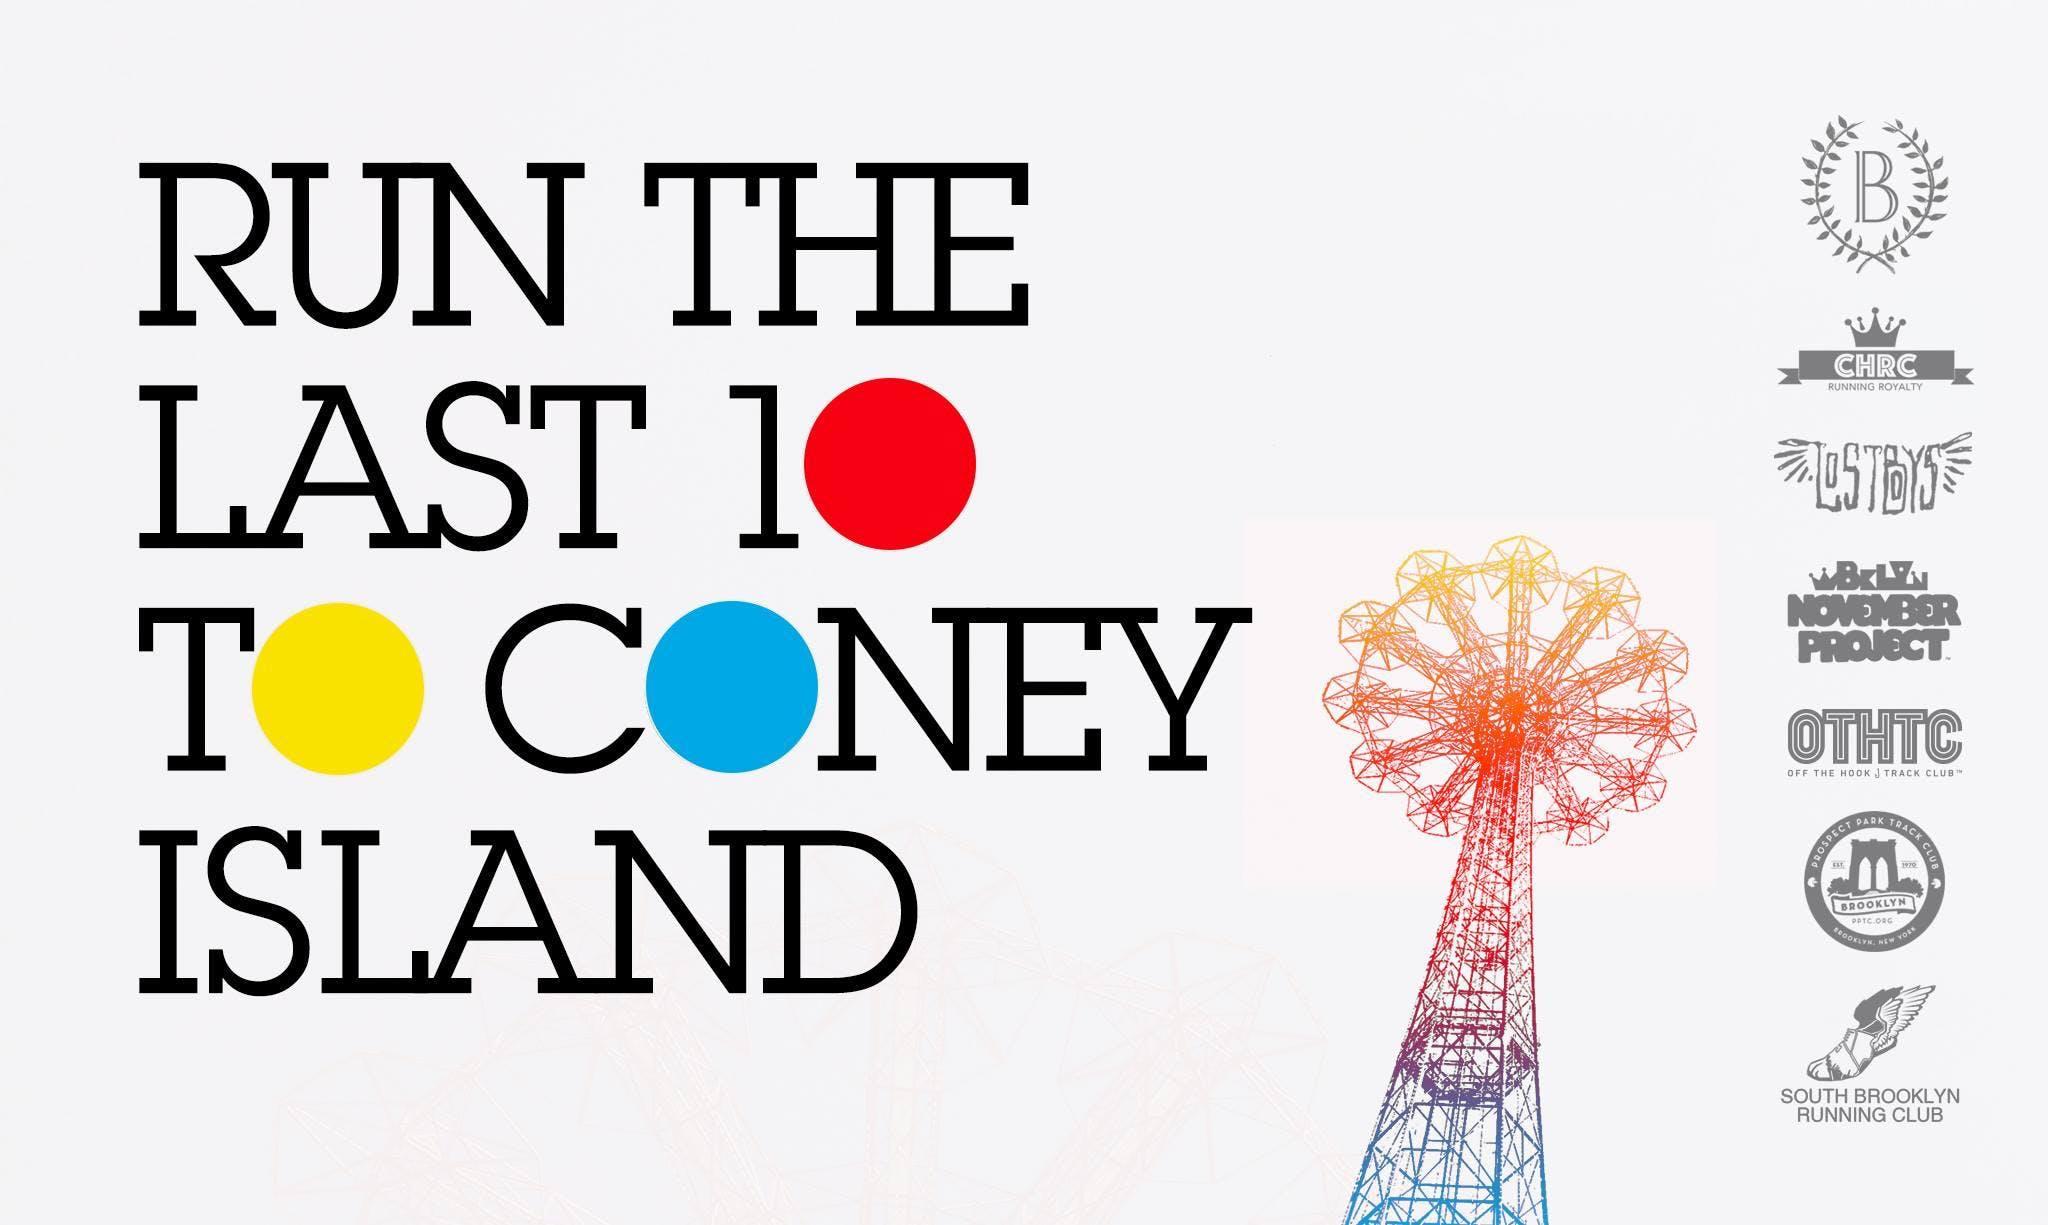 The Last 10 to Coney Island